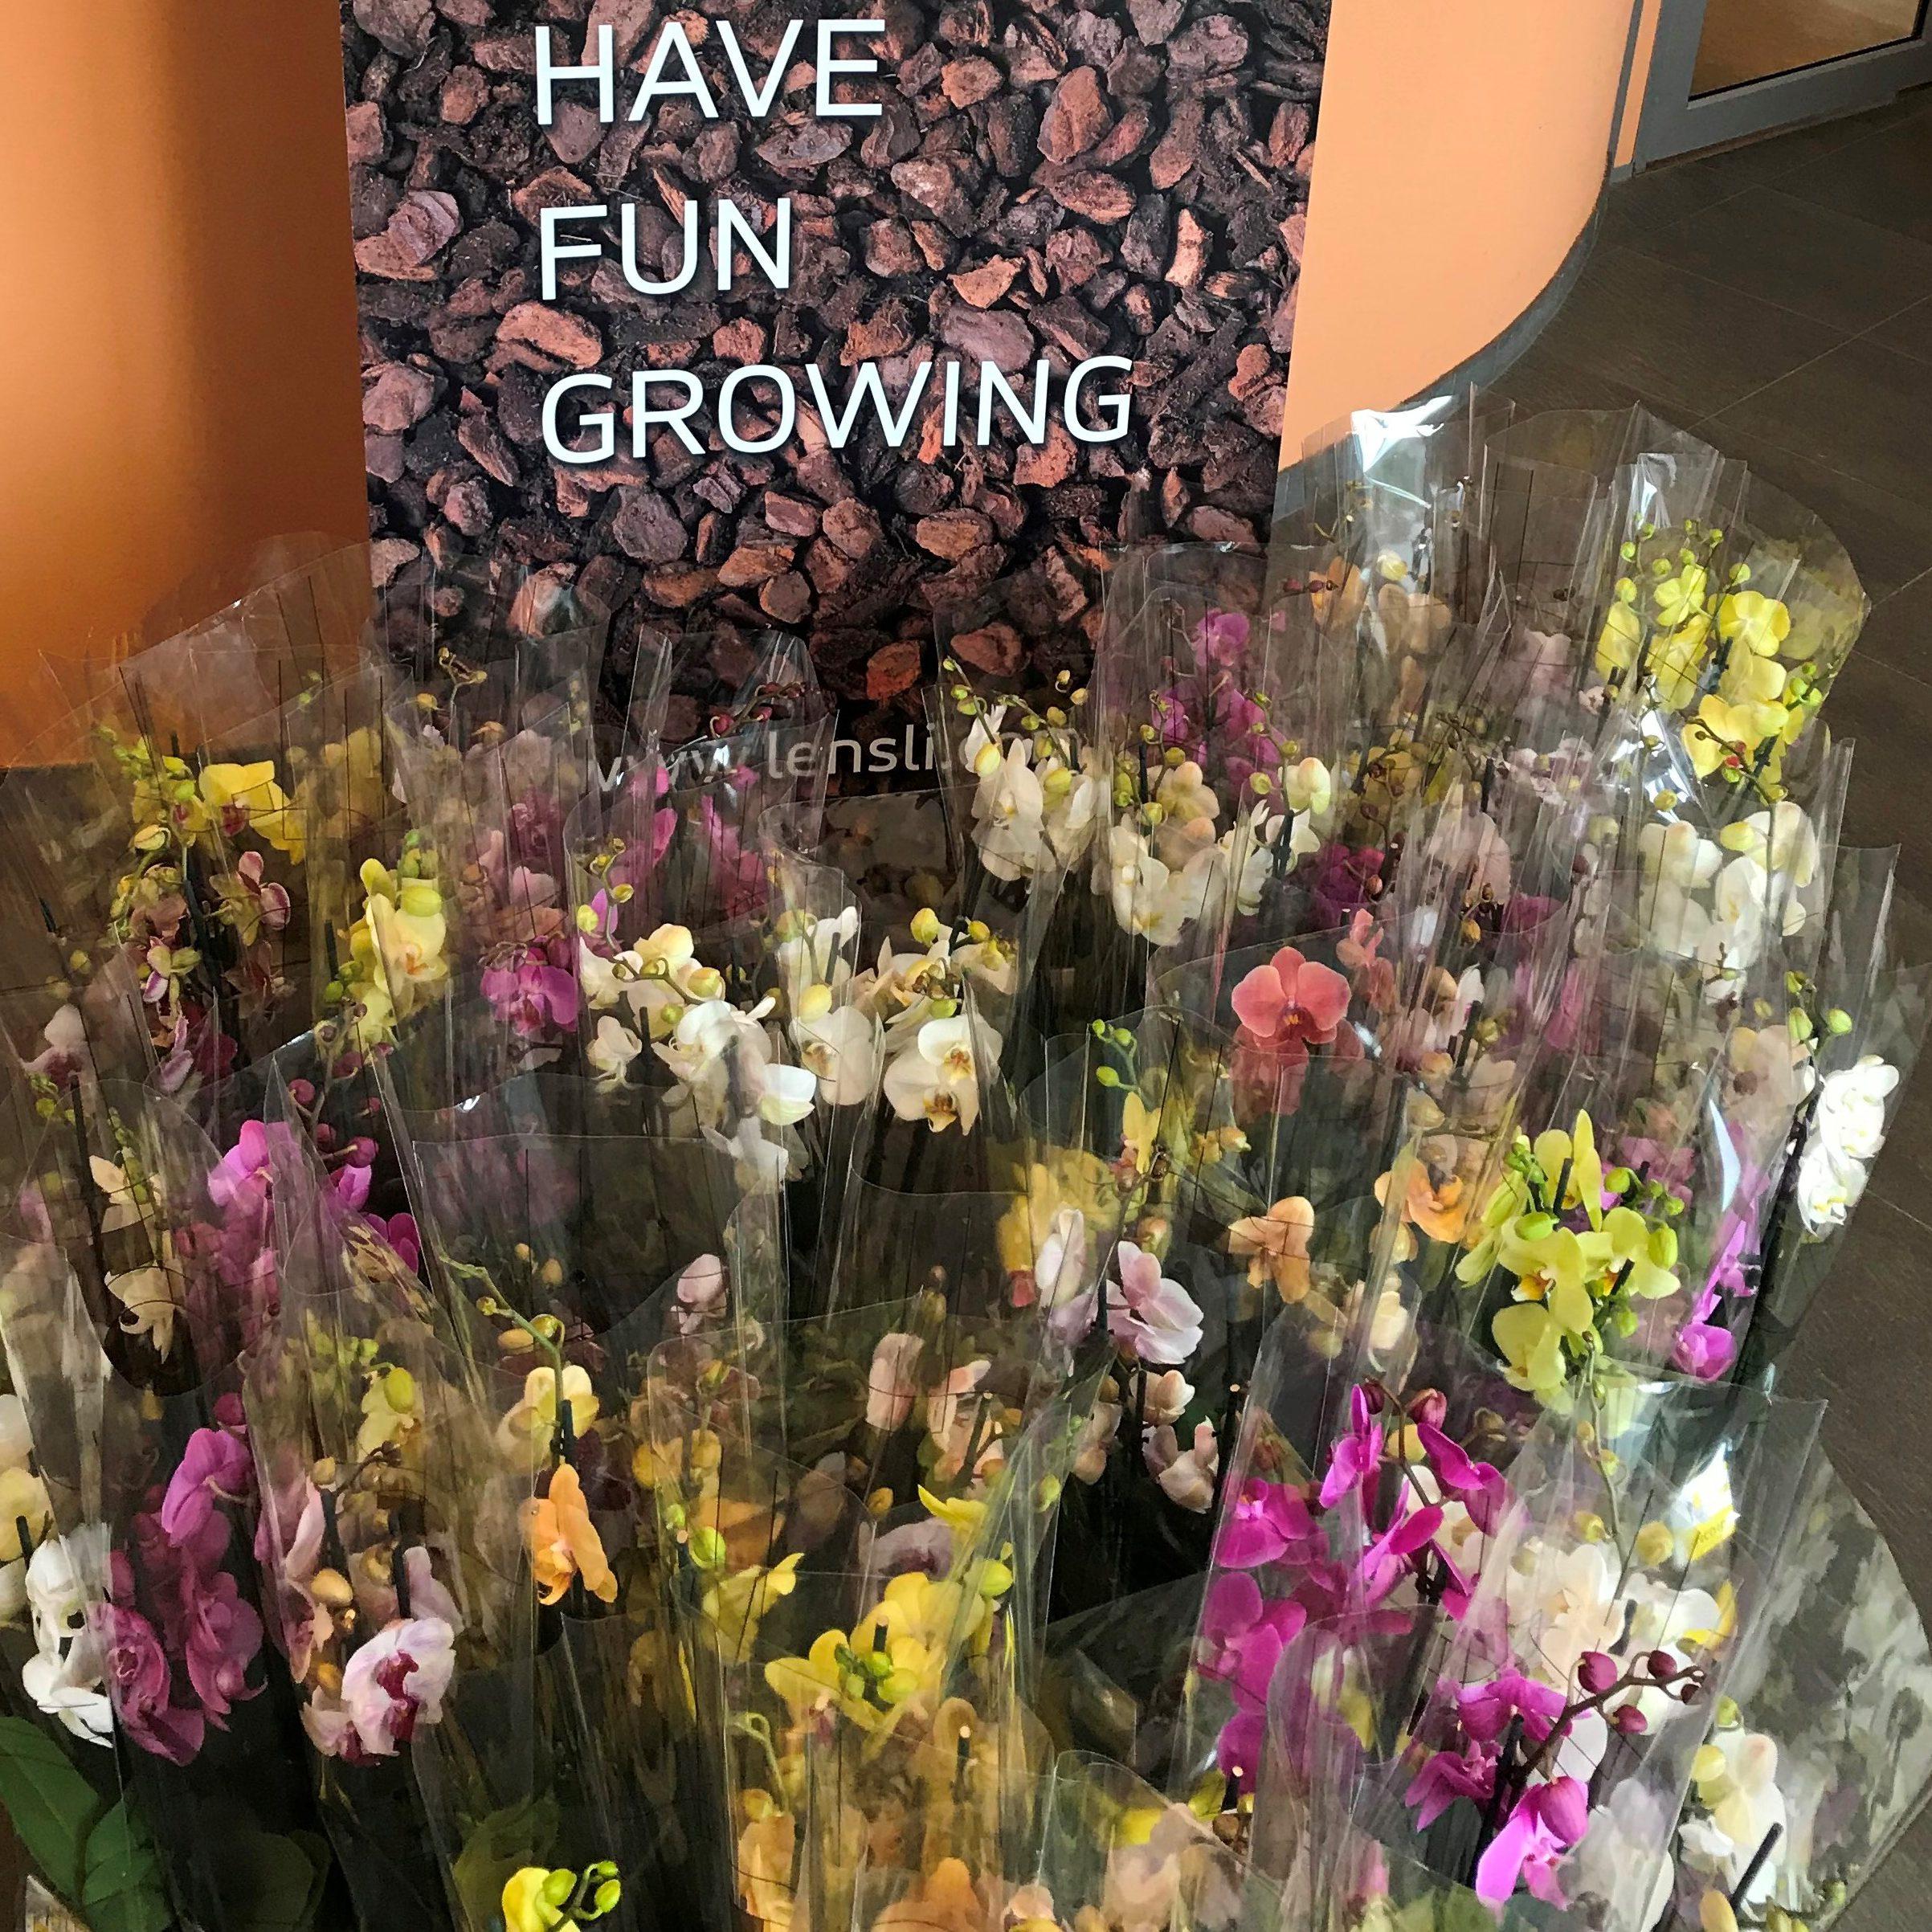 Lensli steunt FlowerBoostChallenge